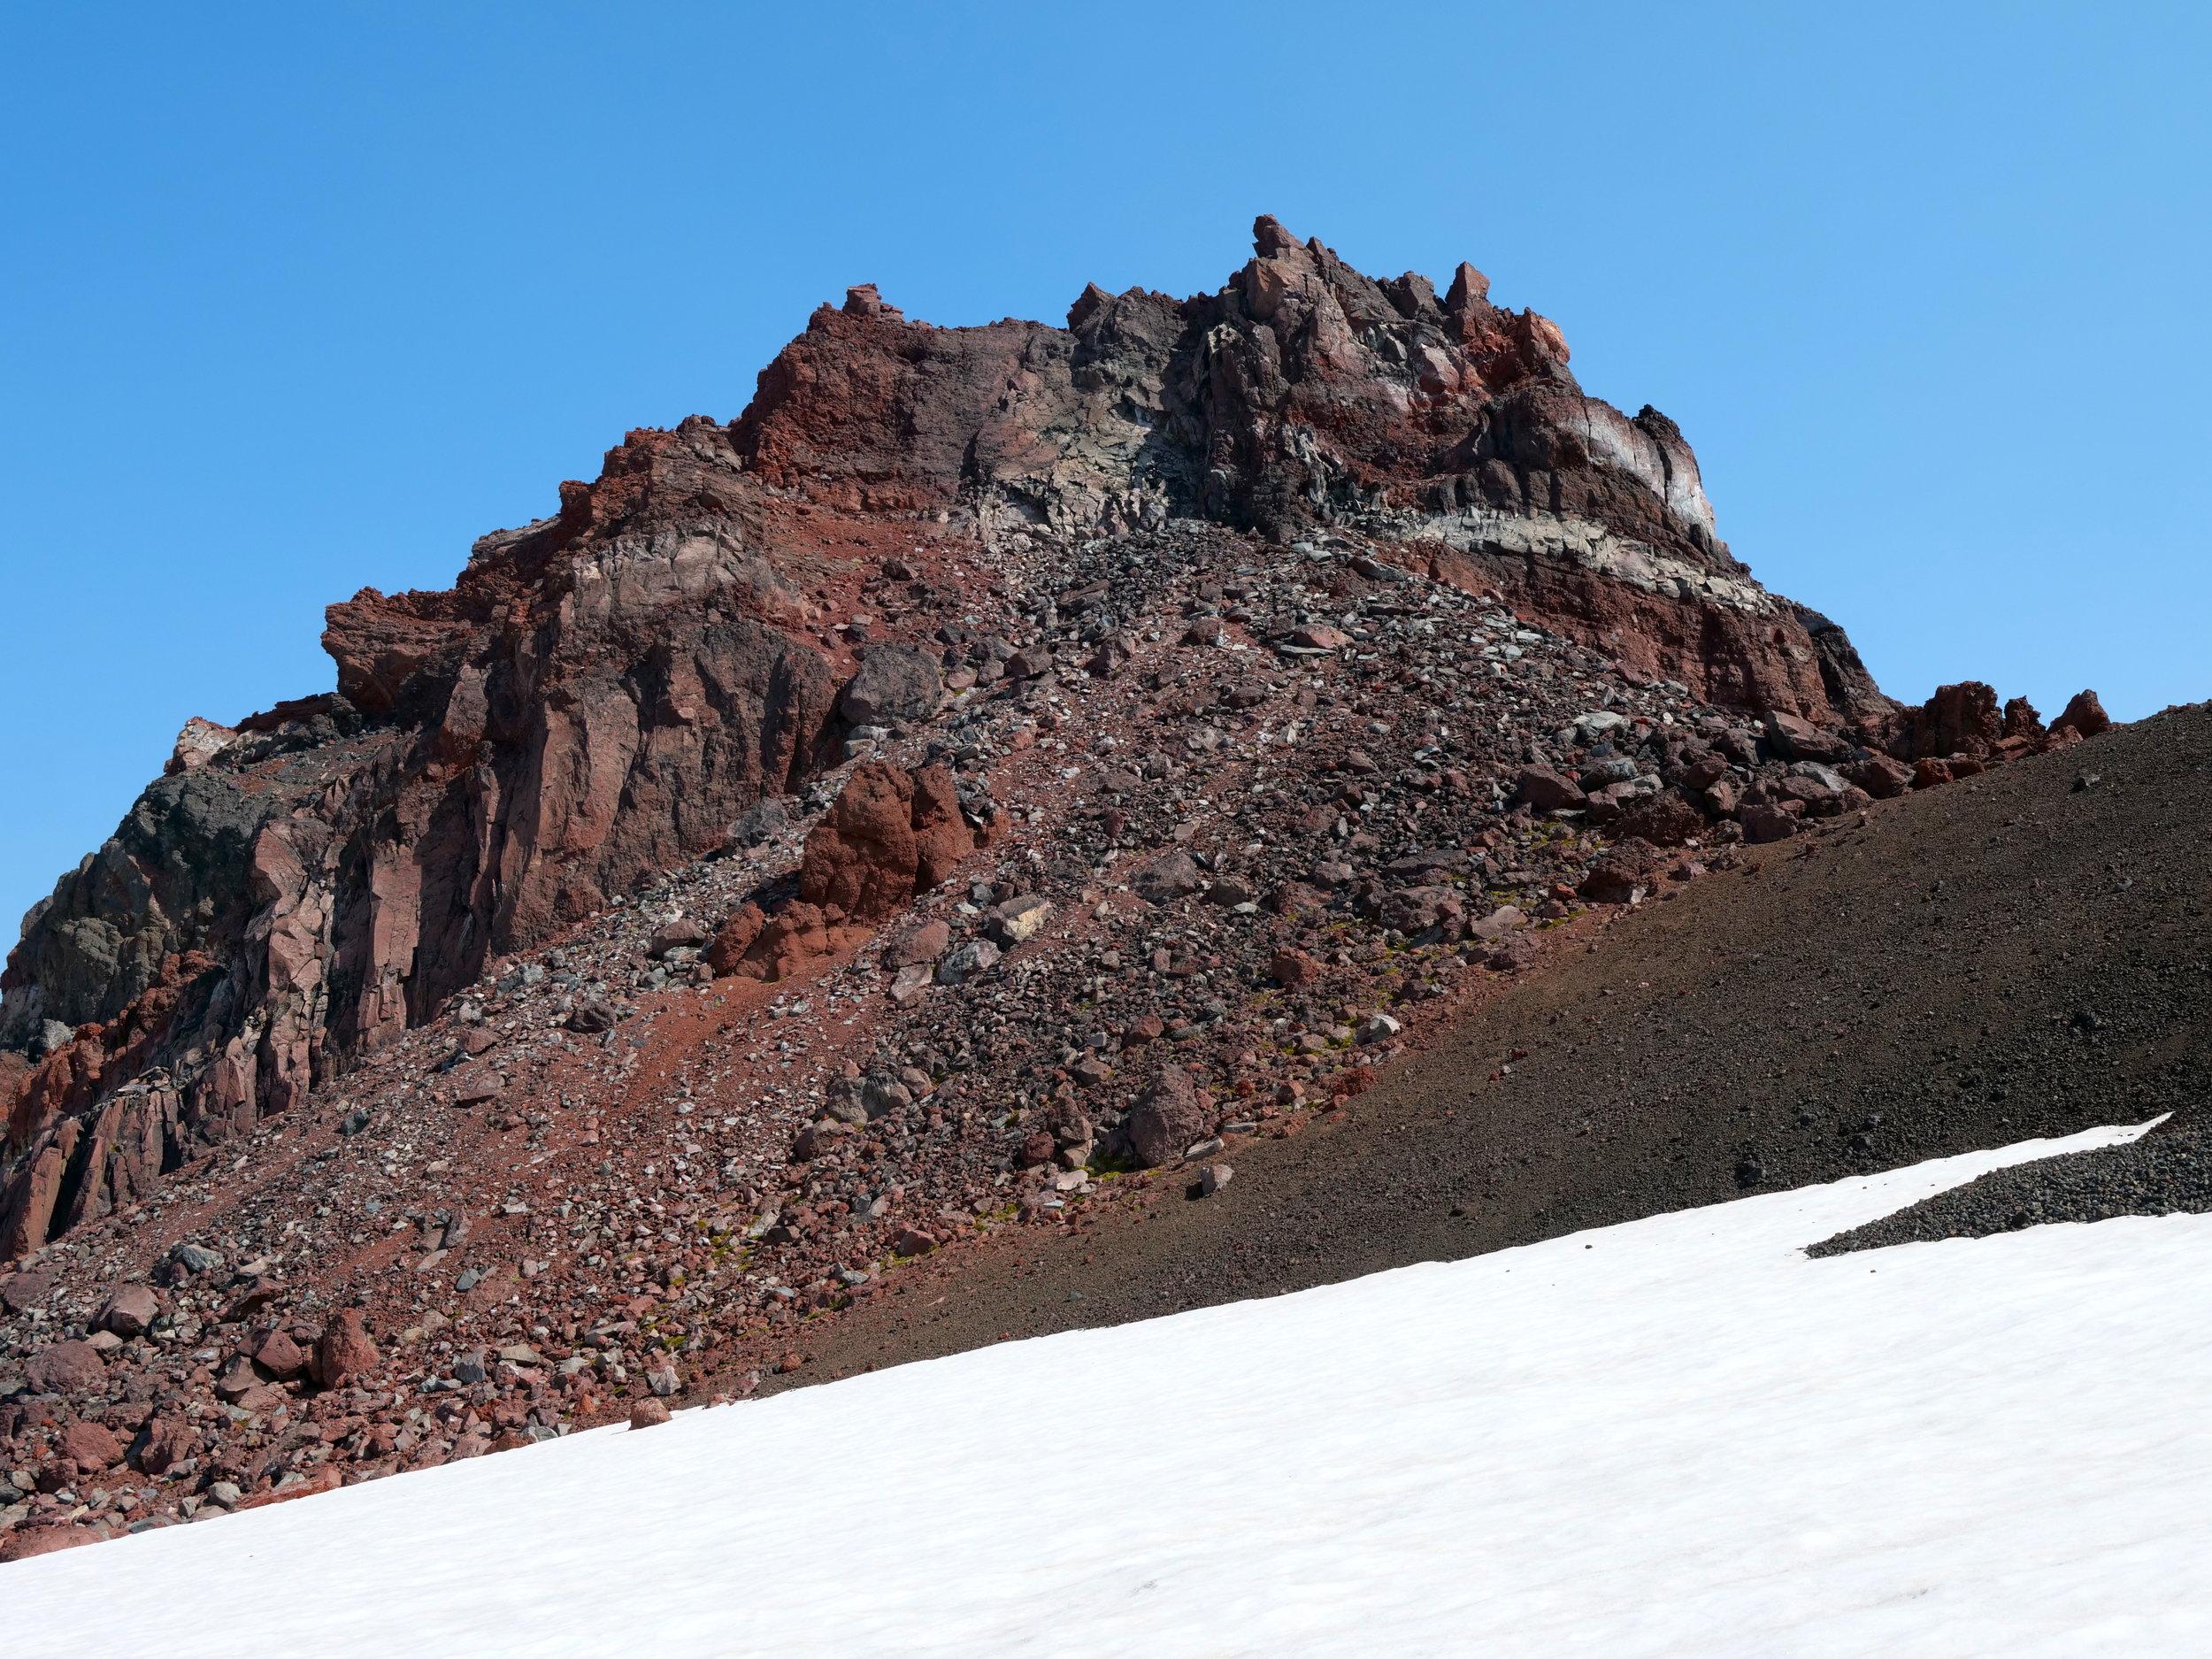 Echo Rock (7871') from the Flett glacier